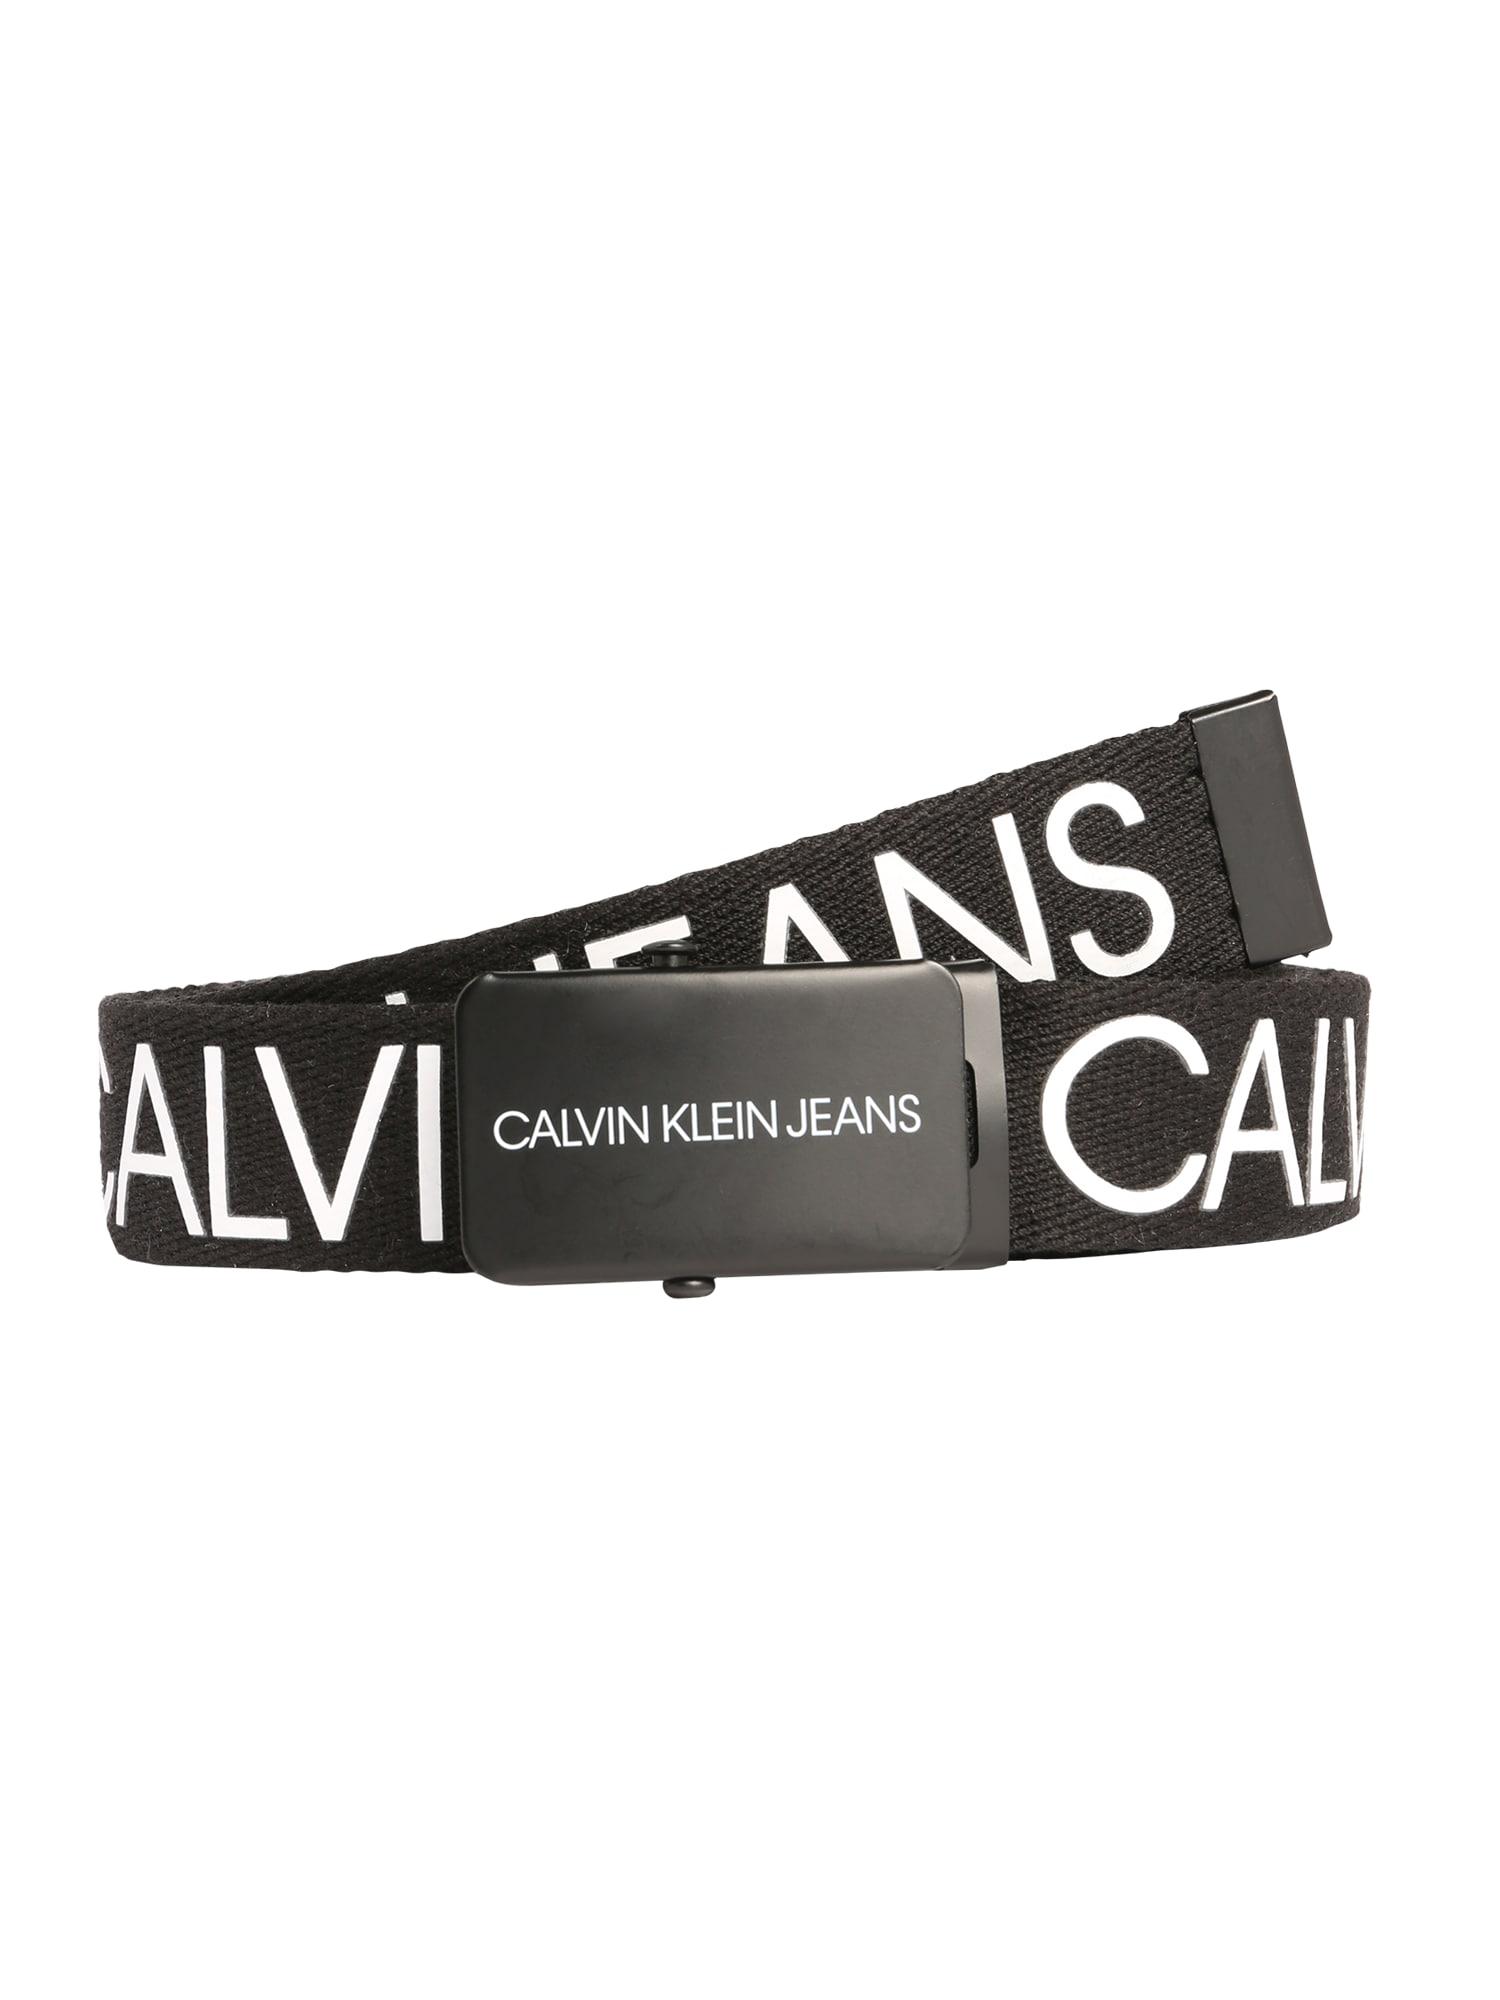 Calvin Klein Jeans Diržas juoda